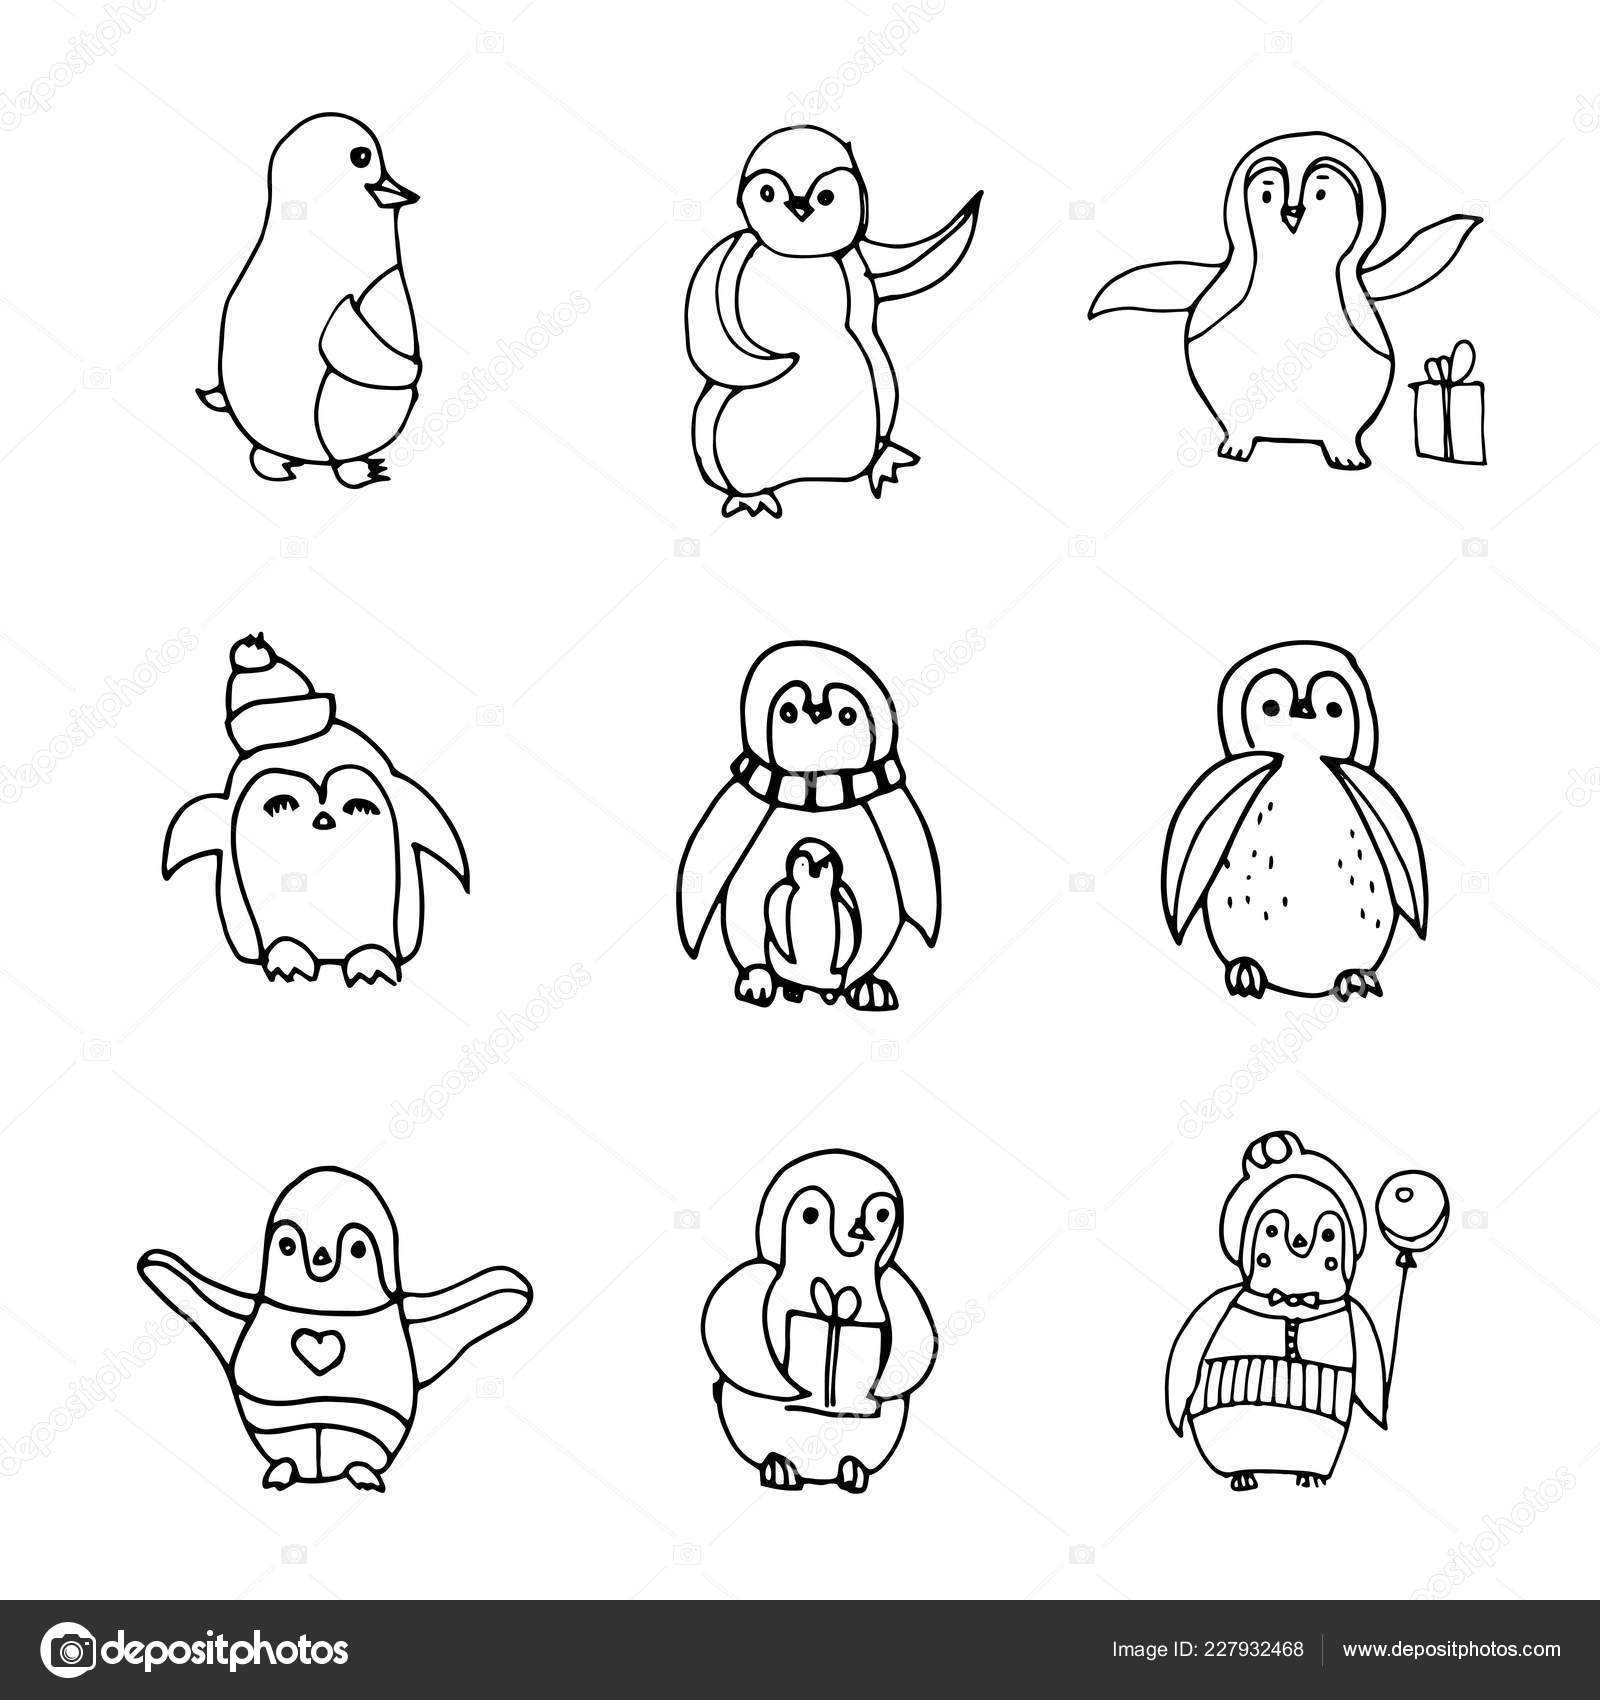 Izolovana Tucnak Rucne Kreslene Ilustrace Vektorove Sada Ruznych